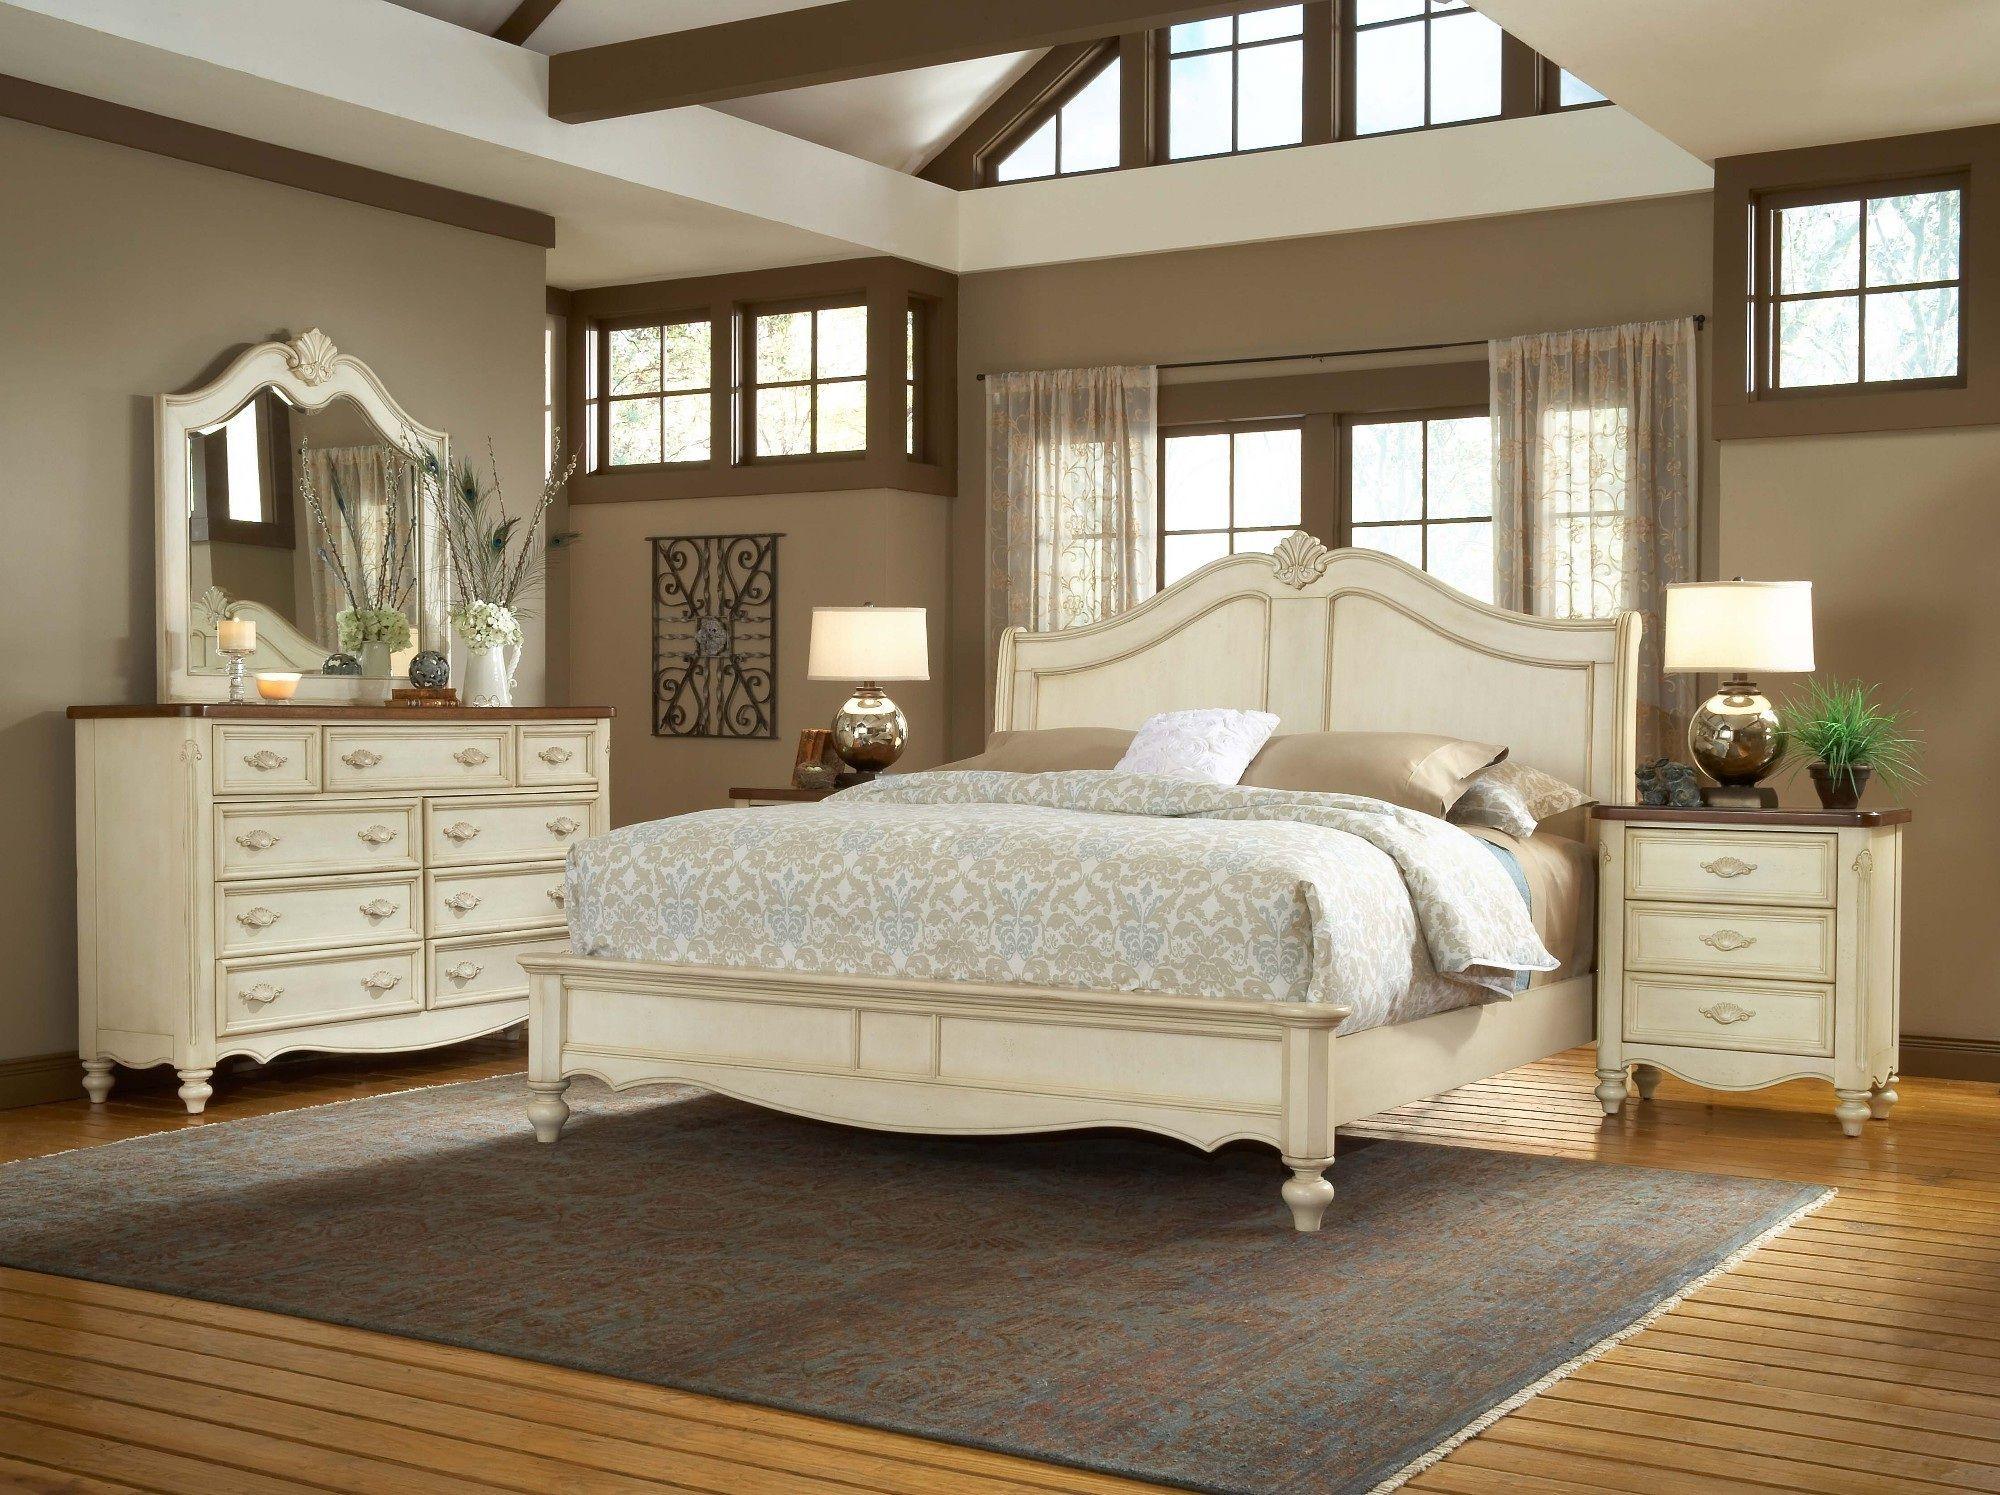 Ikea Furniture Bed Beautiful Room Enchanting Ikea Bedroom Sets Pinterest Encha Ikea Bedroom Sets Distressed White Bedroom Furniture Arranging Bedroom Furniture